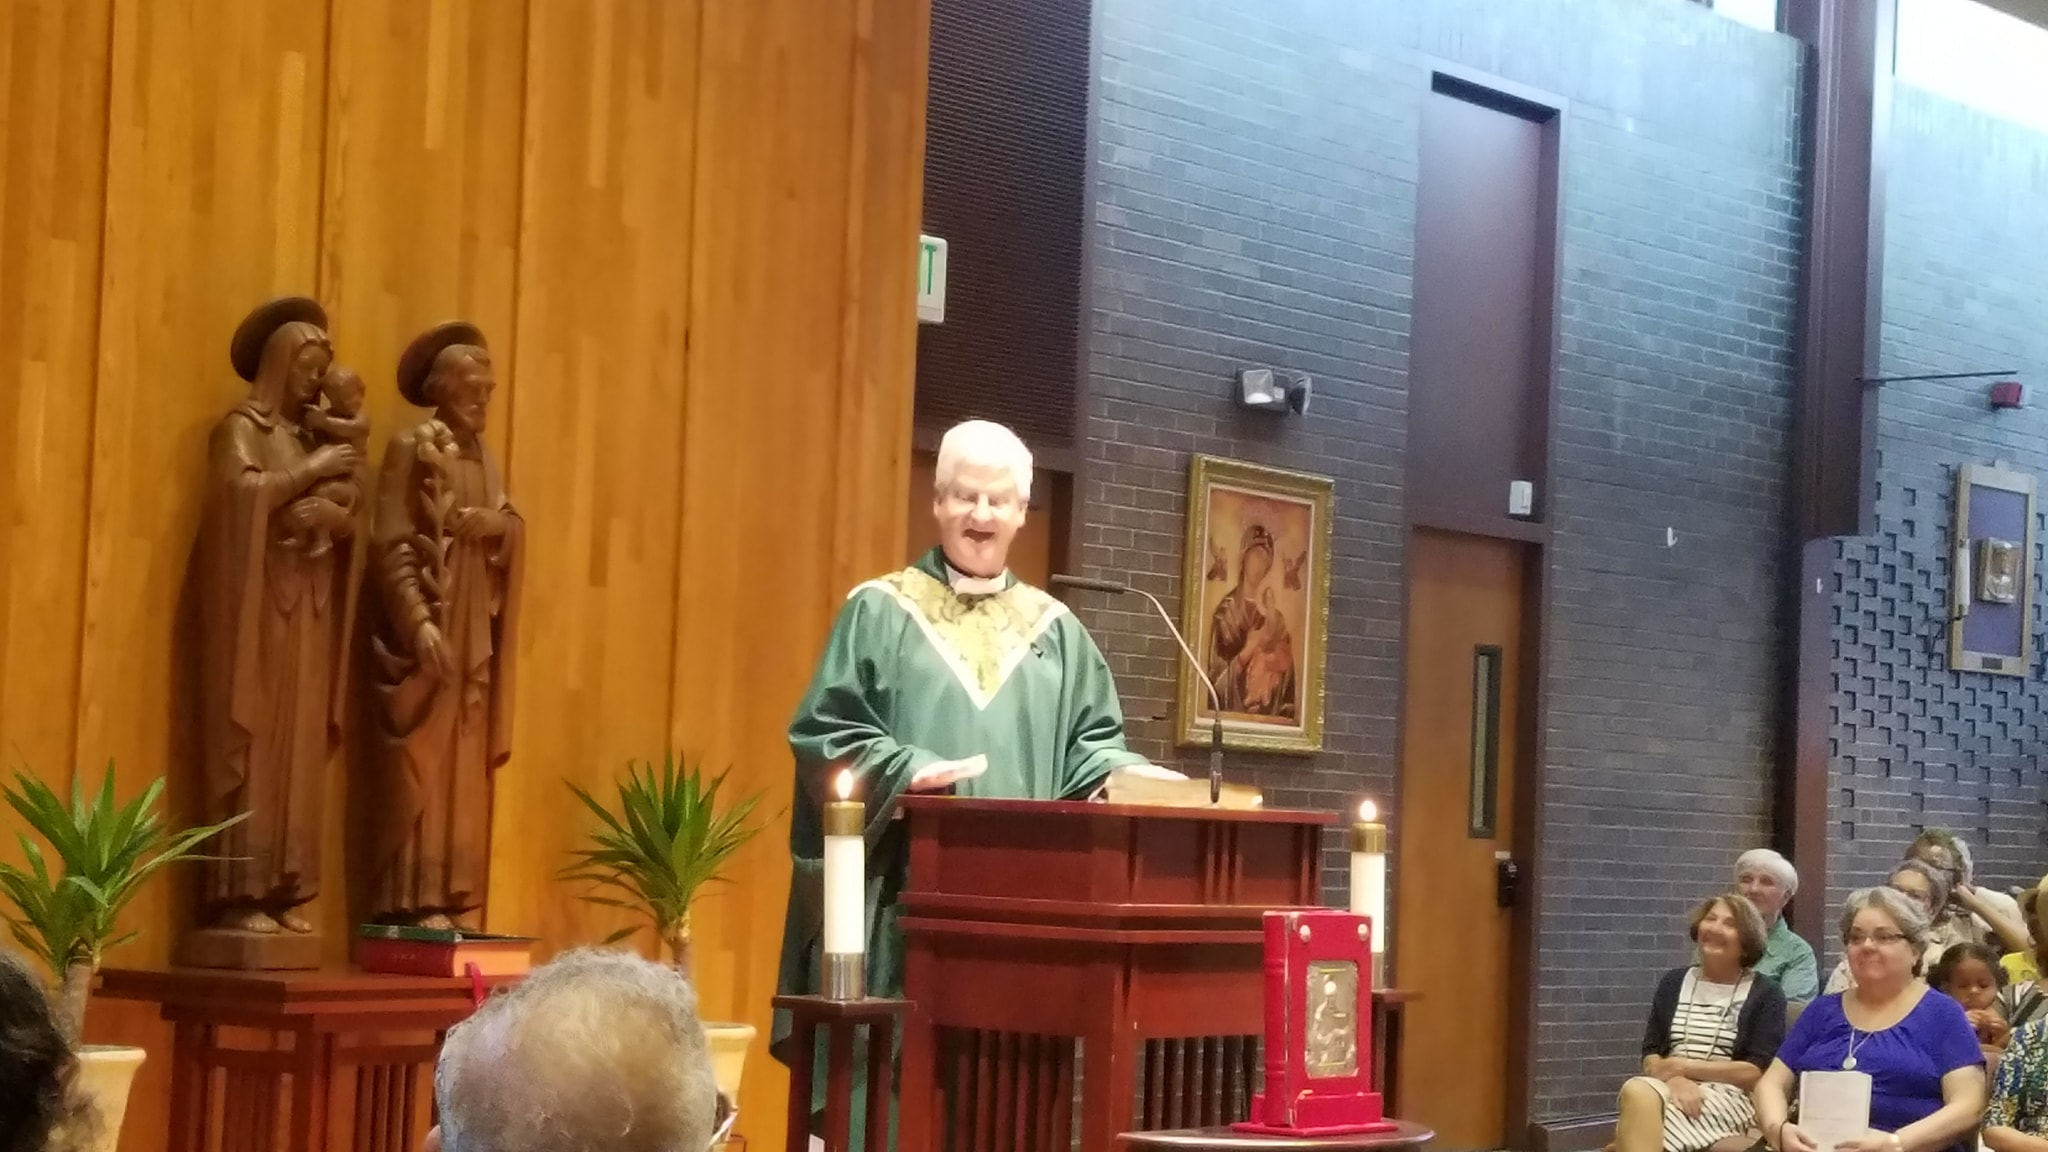 Fr. Rich at St. John's 2.jpg